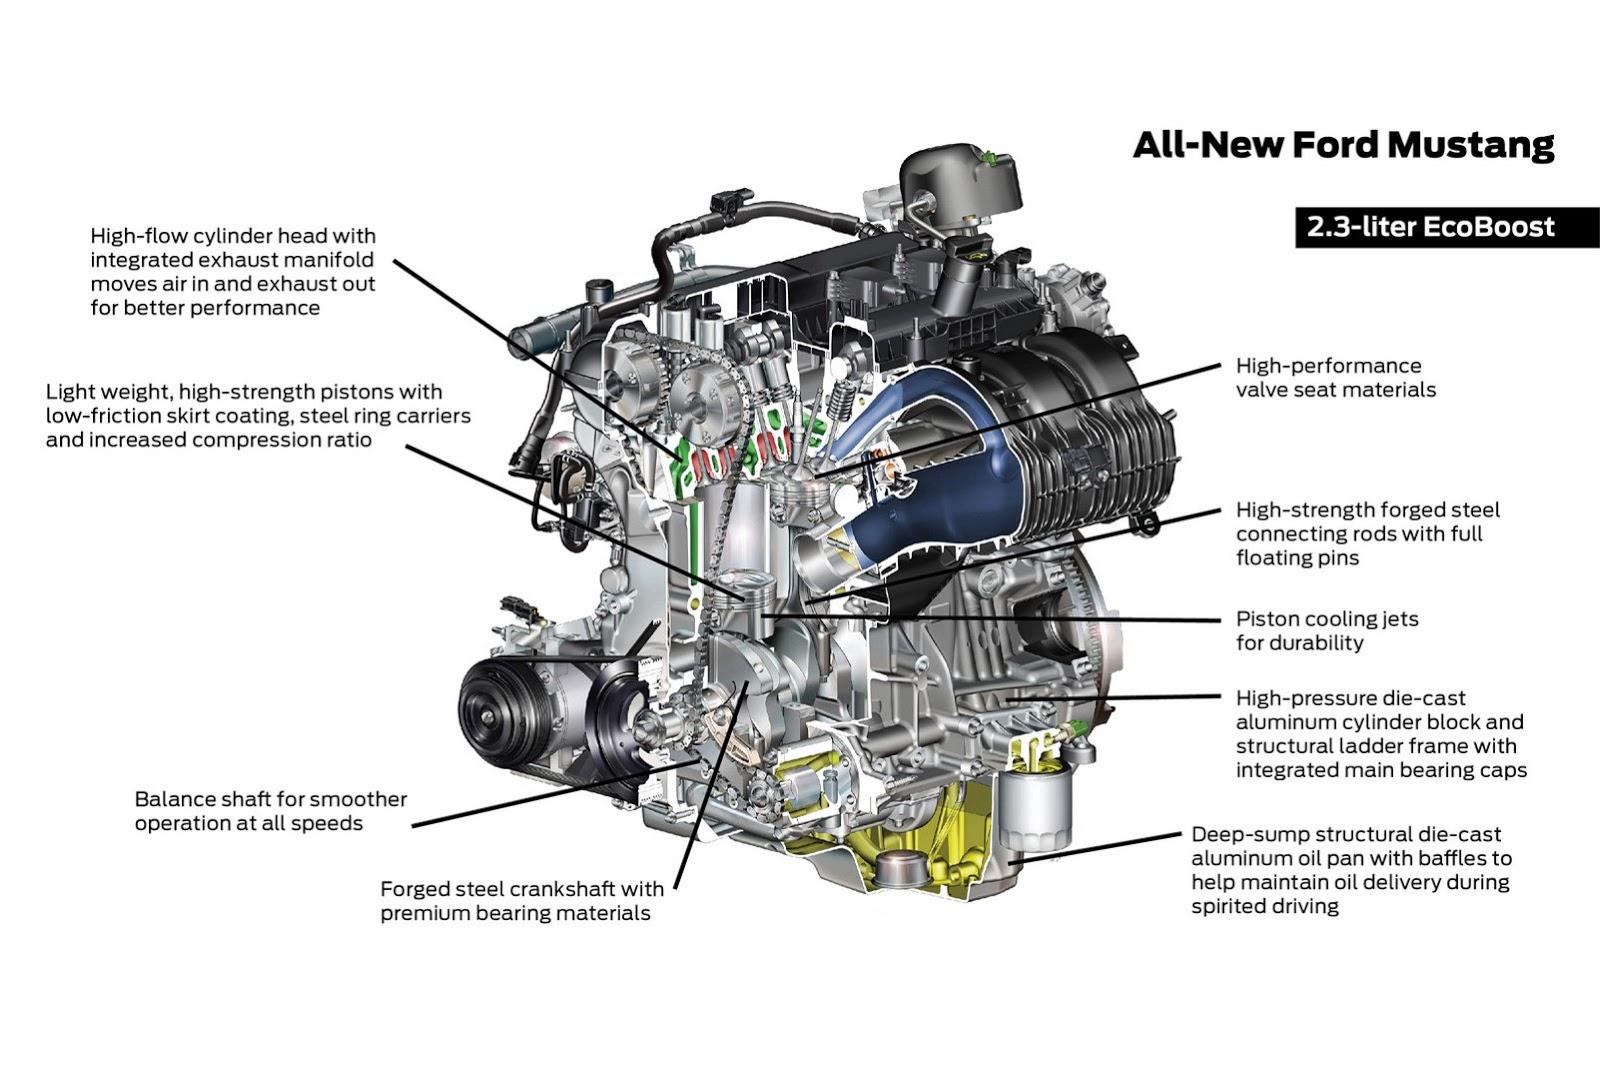 hight resolution of muscle car engine diagram wiring library rh 53 skriptoase de chevy 454 engine diagram simple car